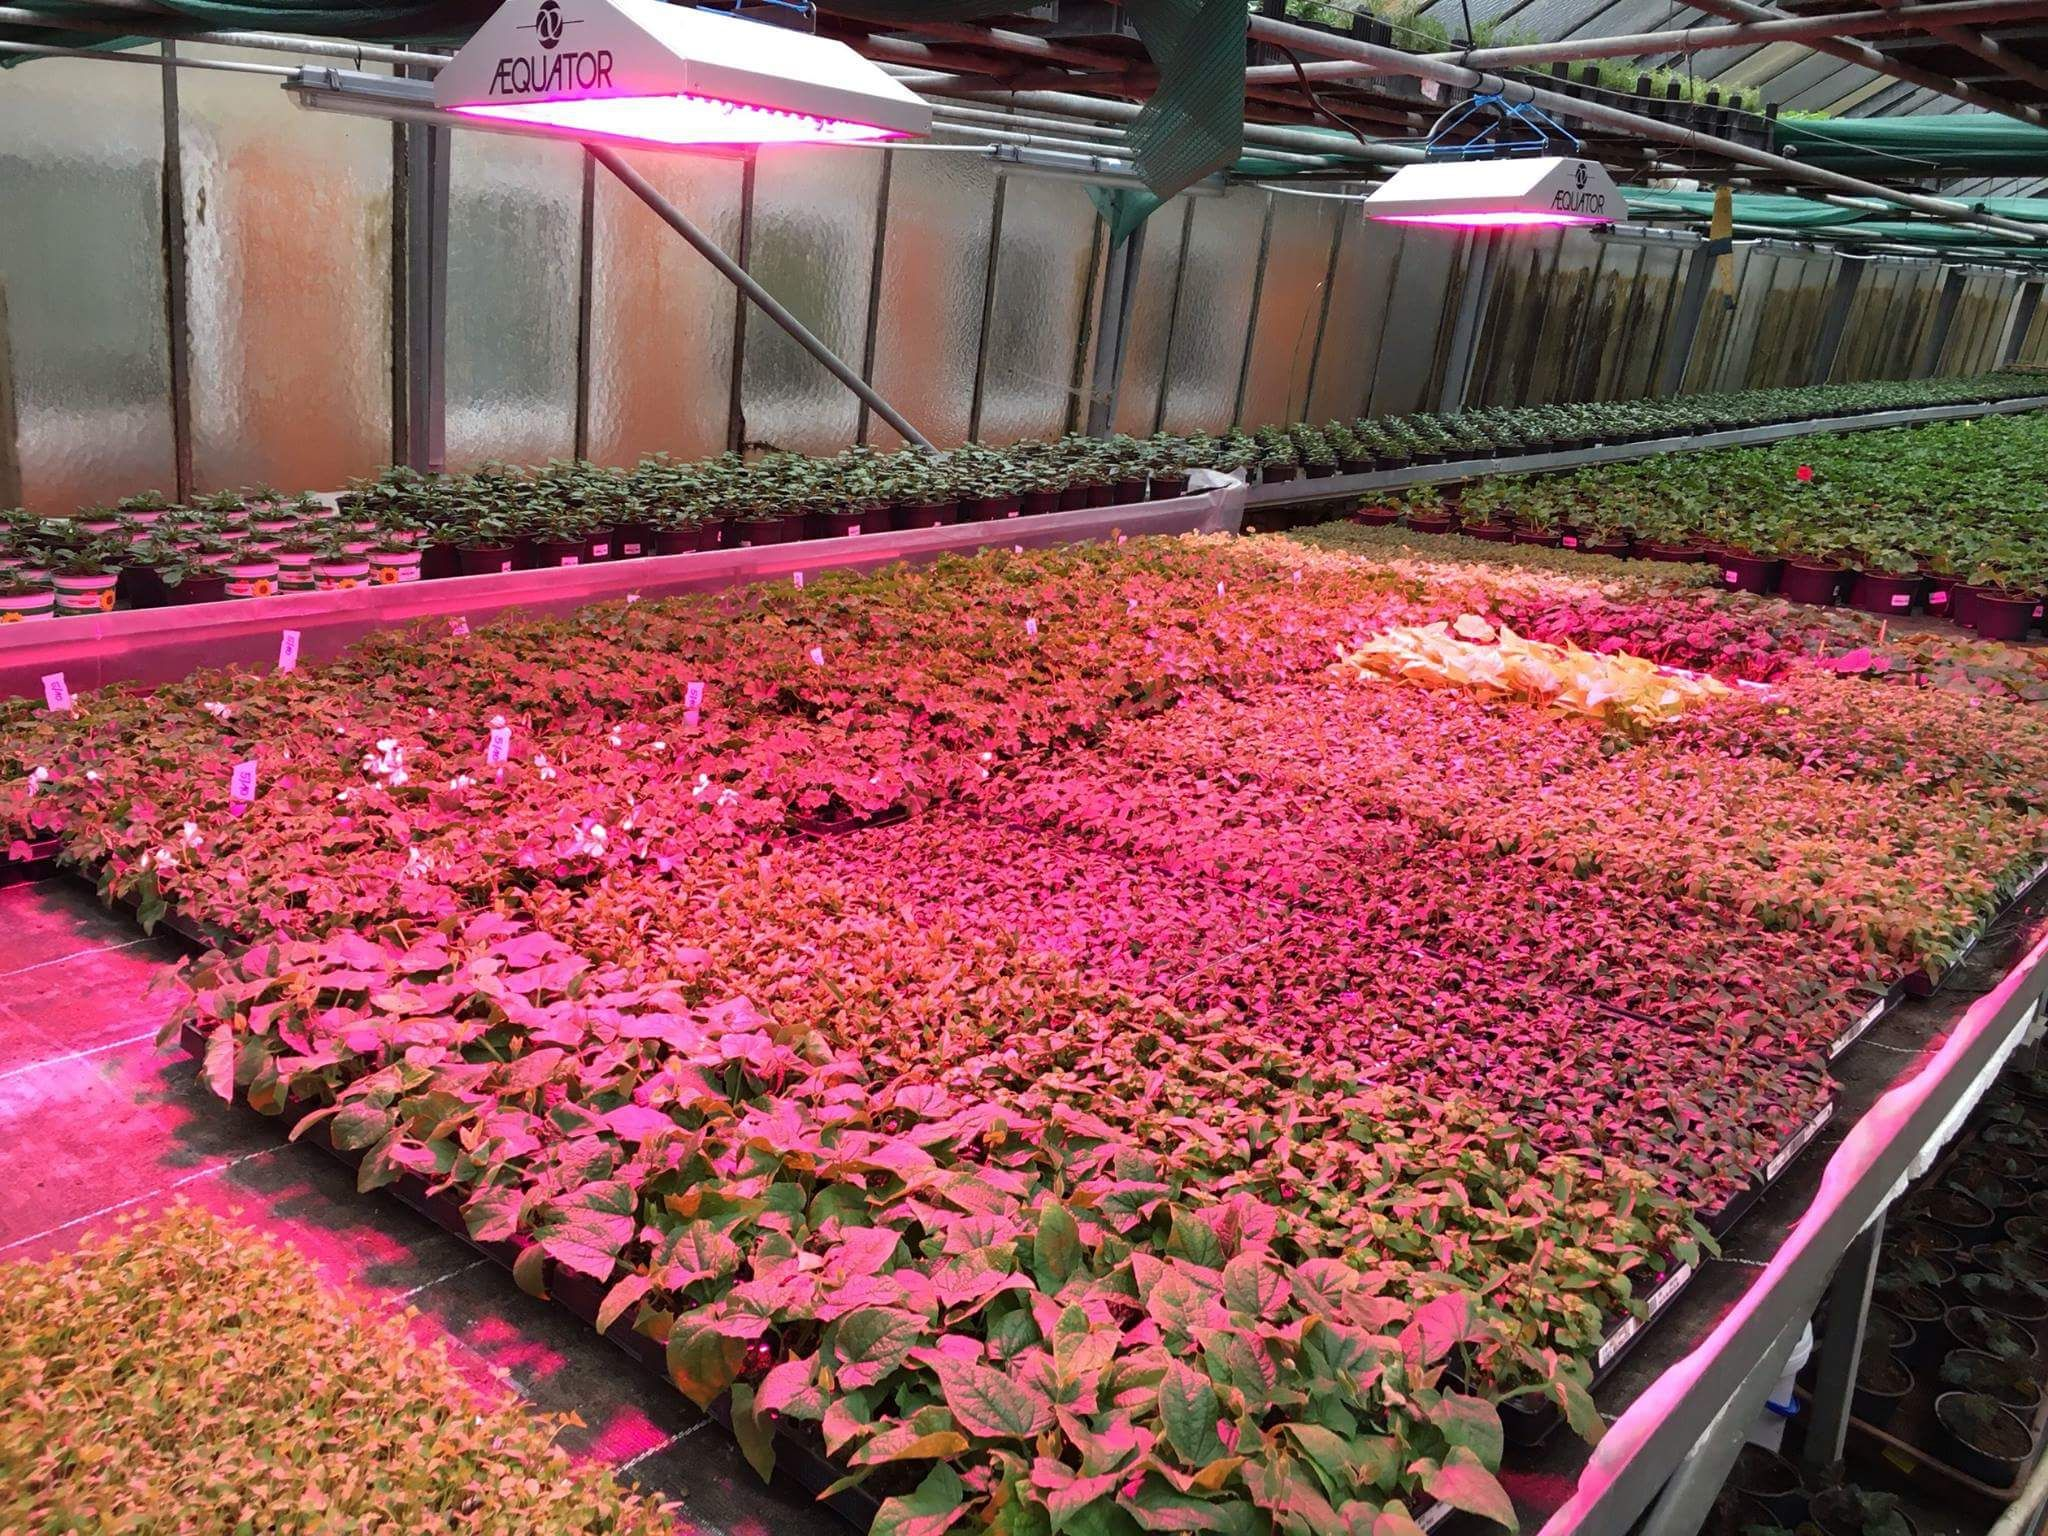 Mayr Gartengenuss Led Pflanzen Lampe Licht Beleuchtung Gartenbau Gemusebau Gartnerei Horticulture Greenh Pflanzenlampe Pflanzen Pflanzenbeleuchtung